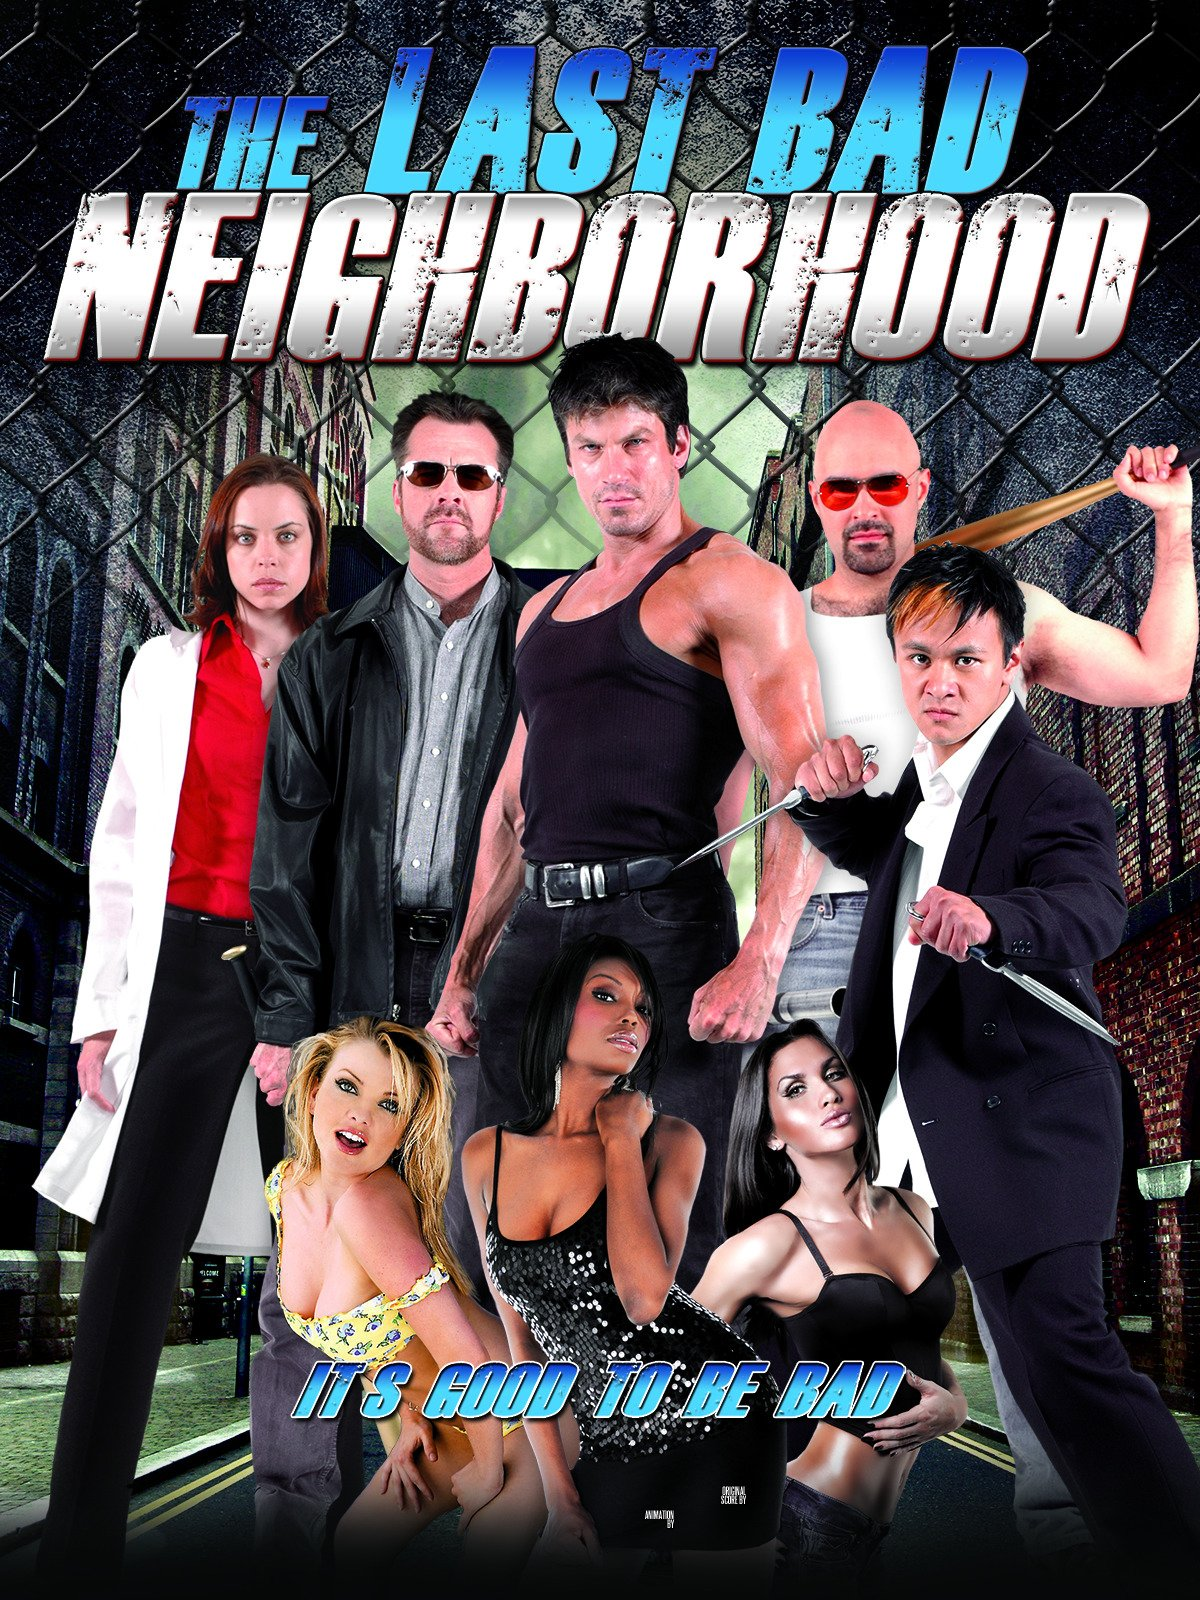 The Last Bad Neighborhood